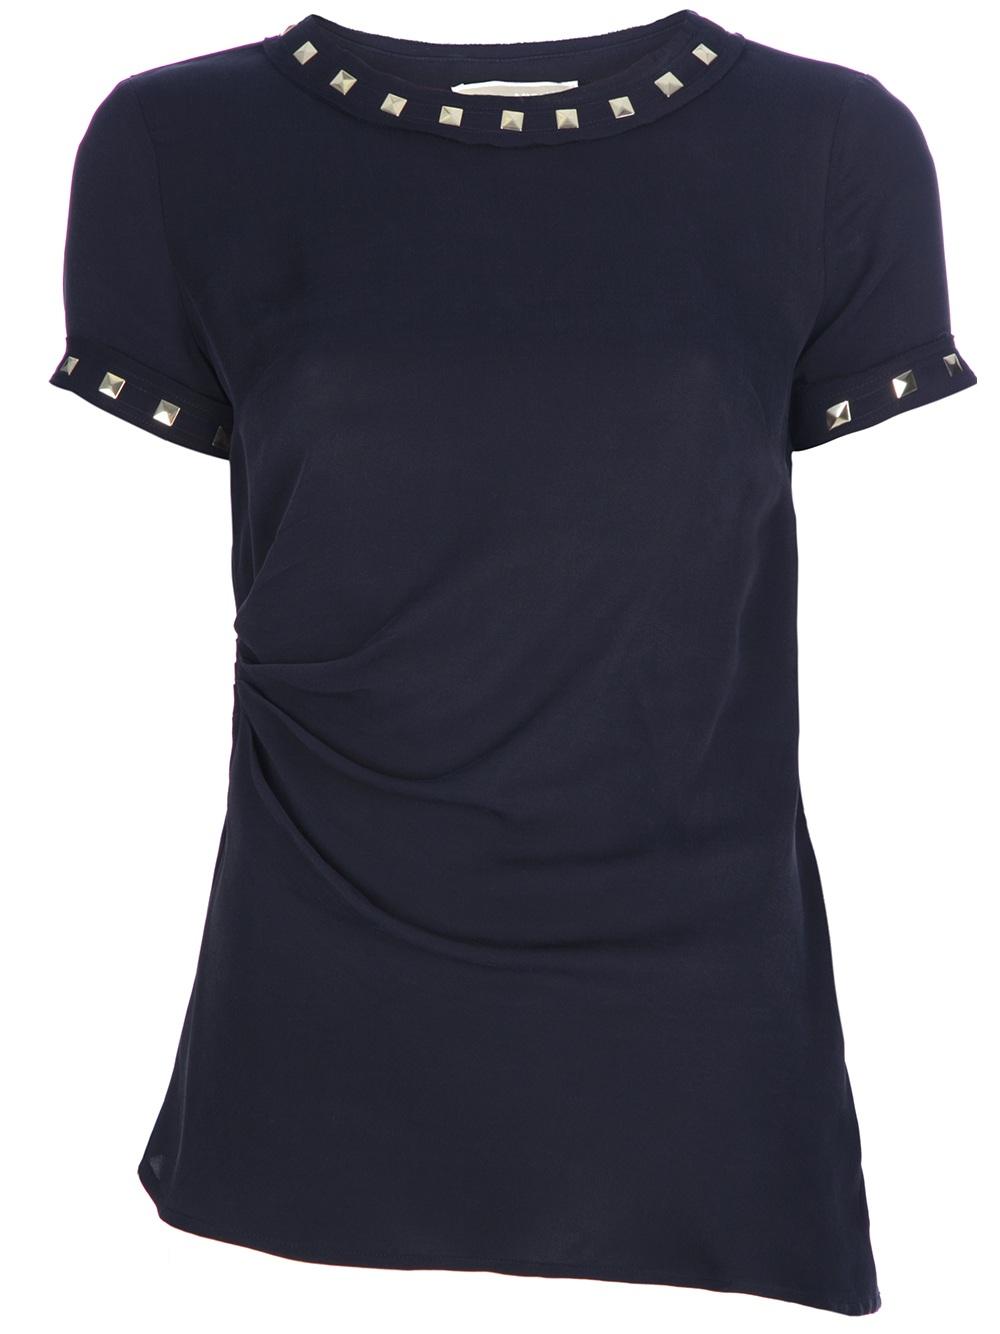 michael kors studded tshirt in blue navy lyst. Black Bedroom Furniture Sets. Home Design Ideas